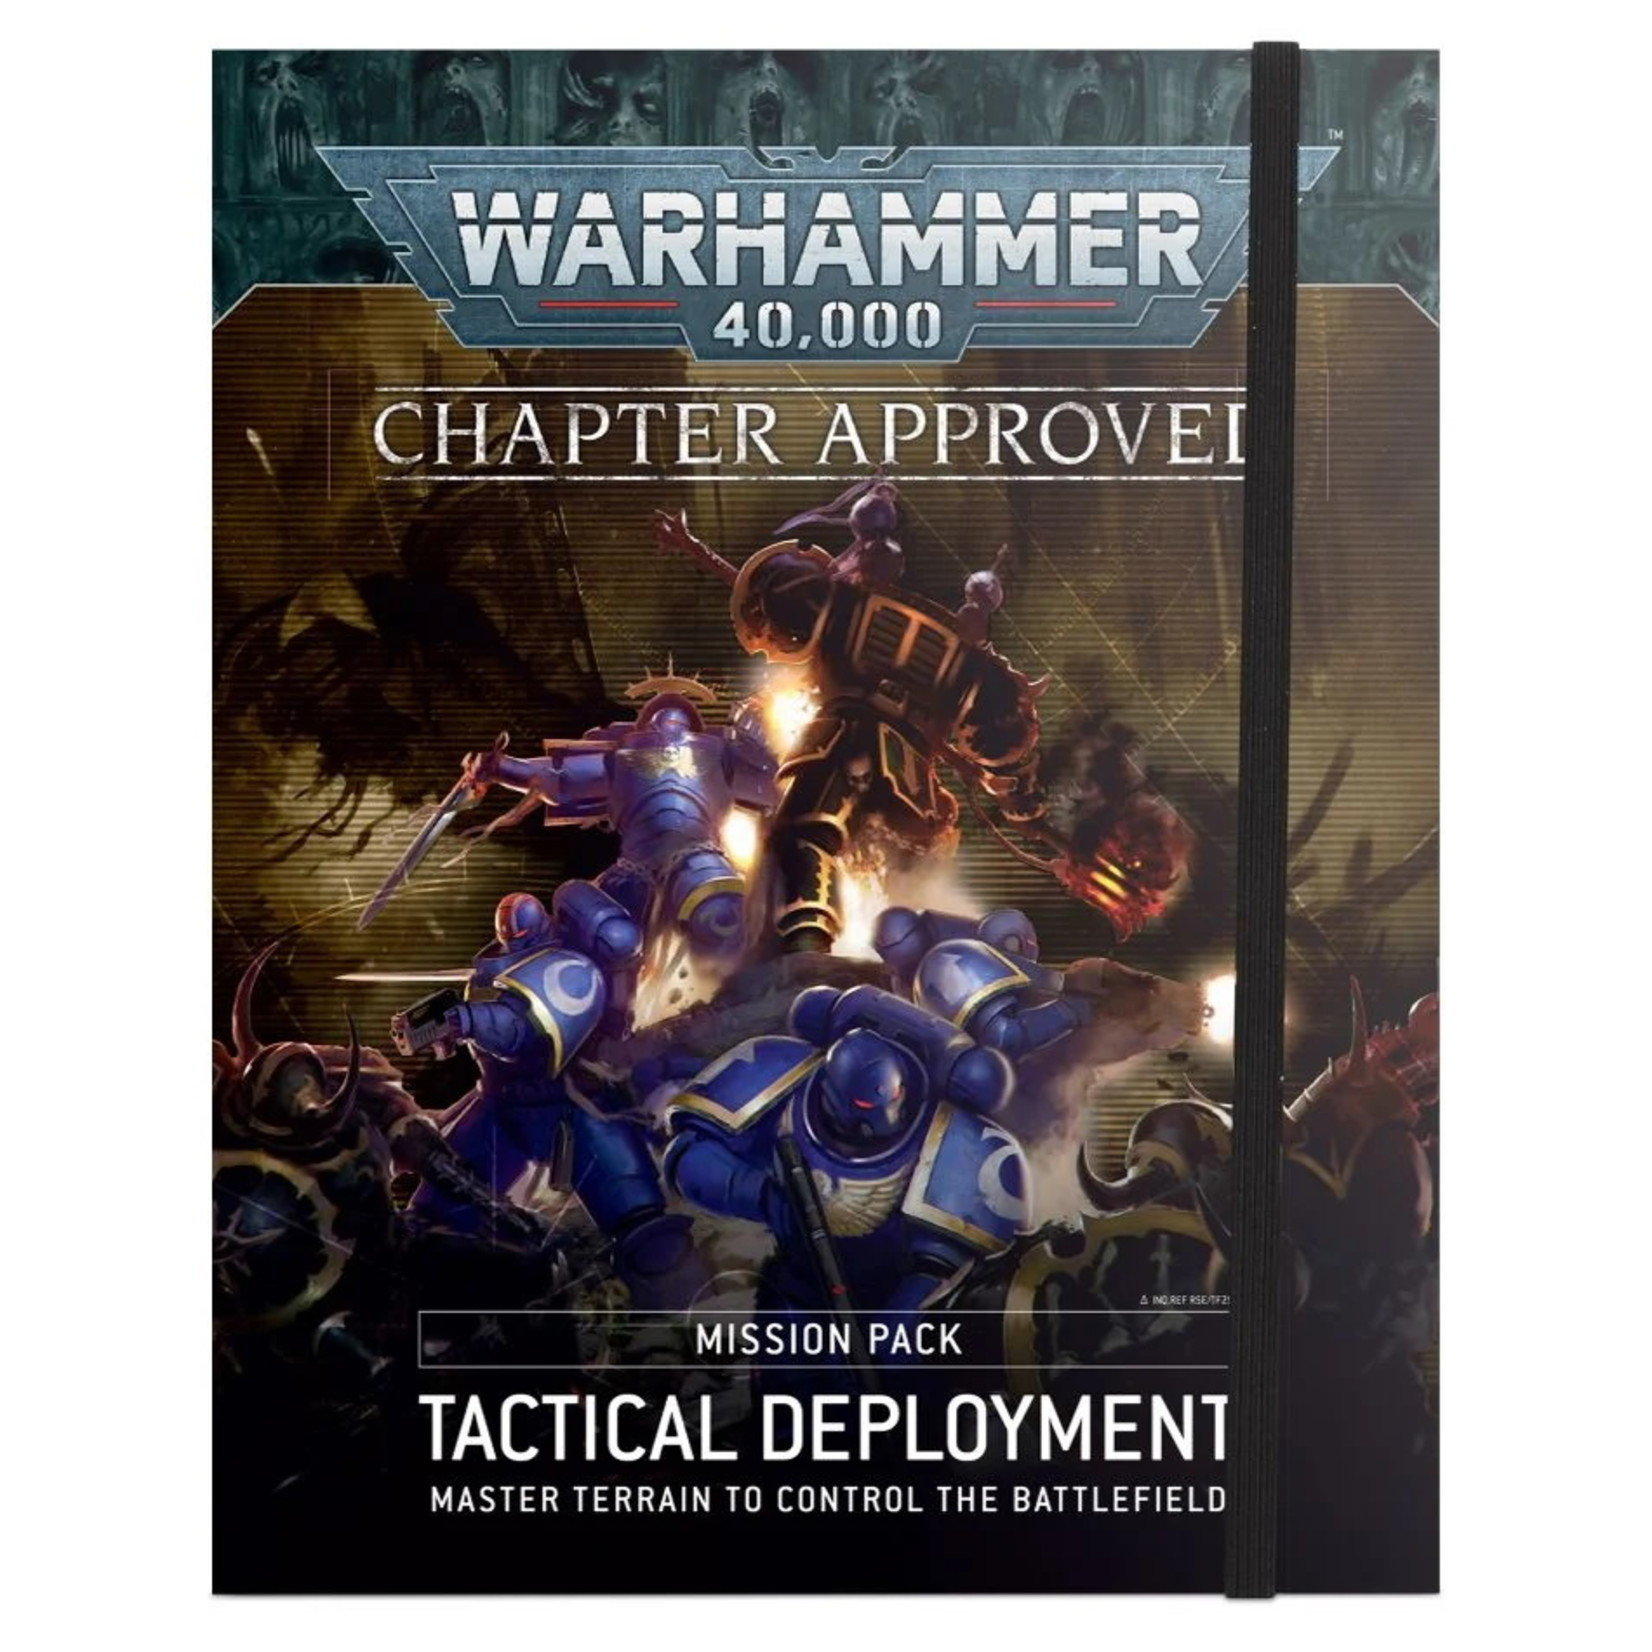 Games Workshop Chapter Approved Mission Pack: Tactical Deployment